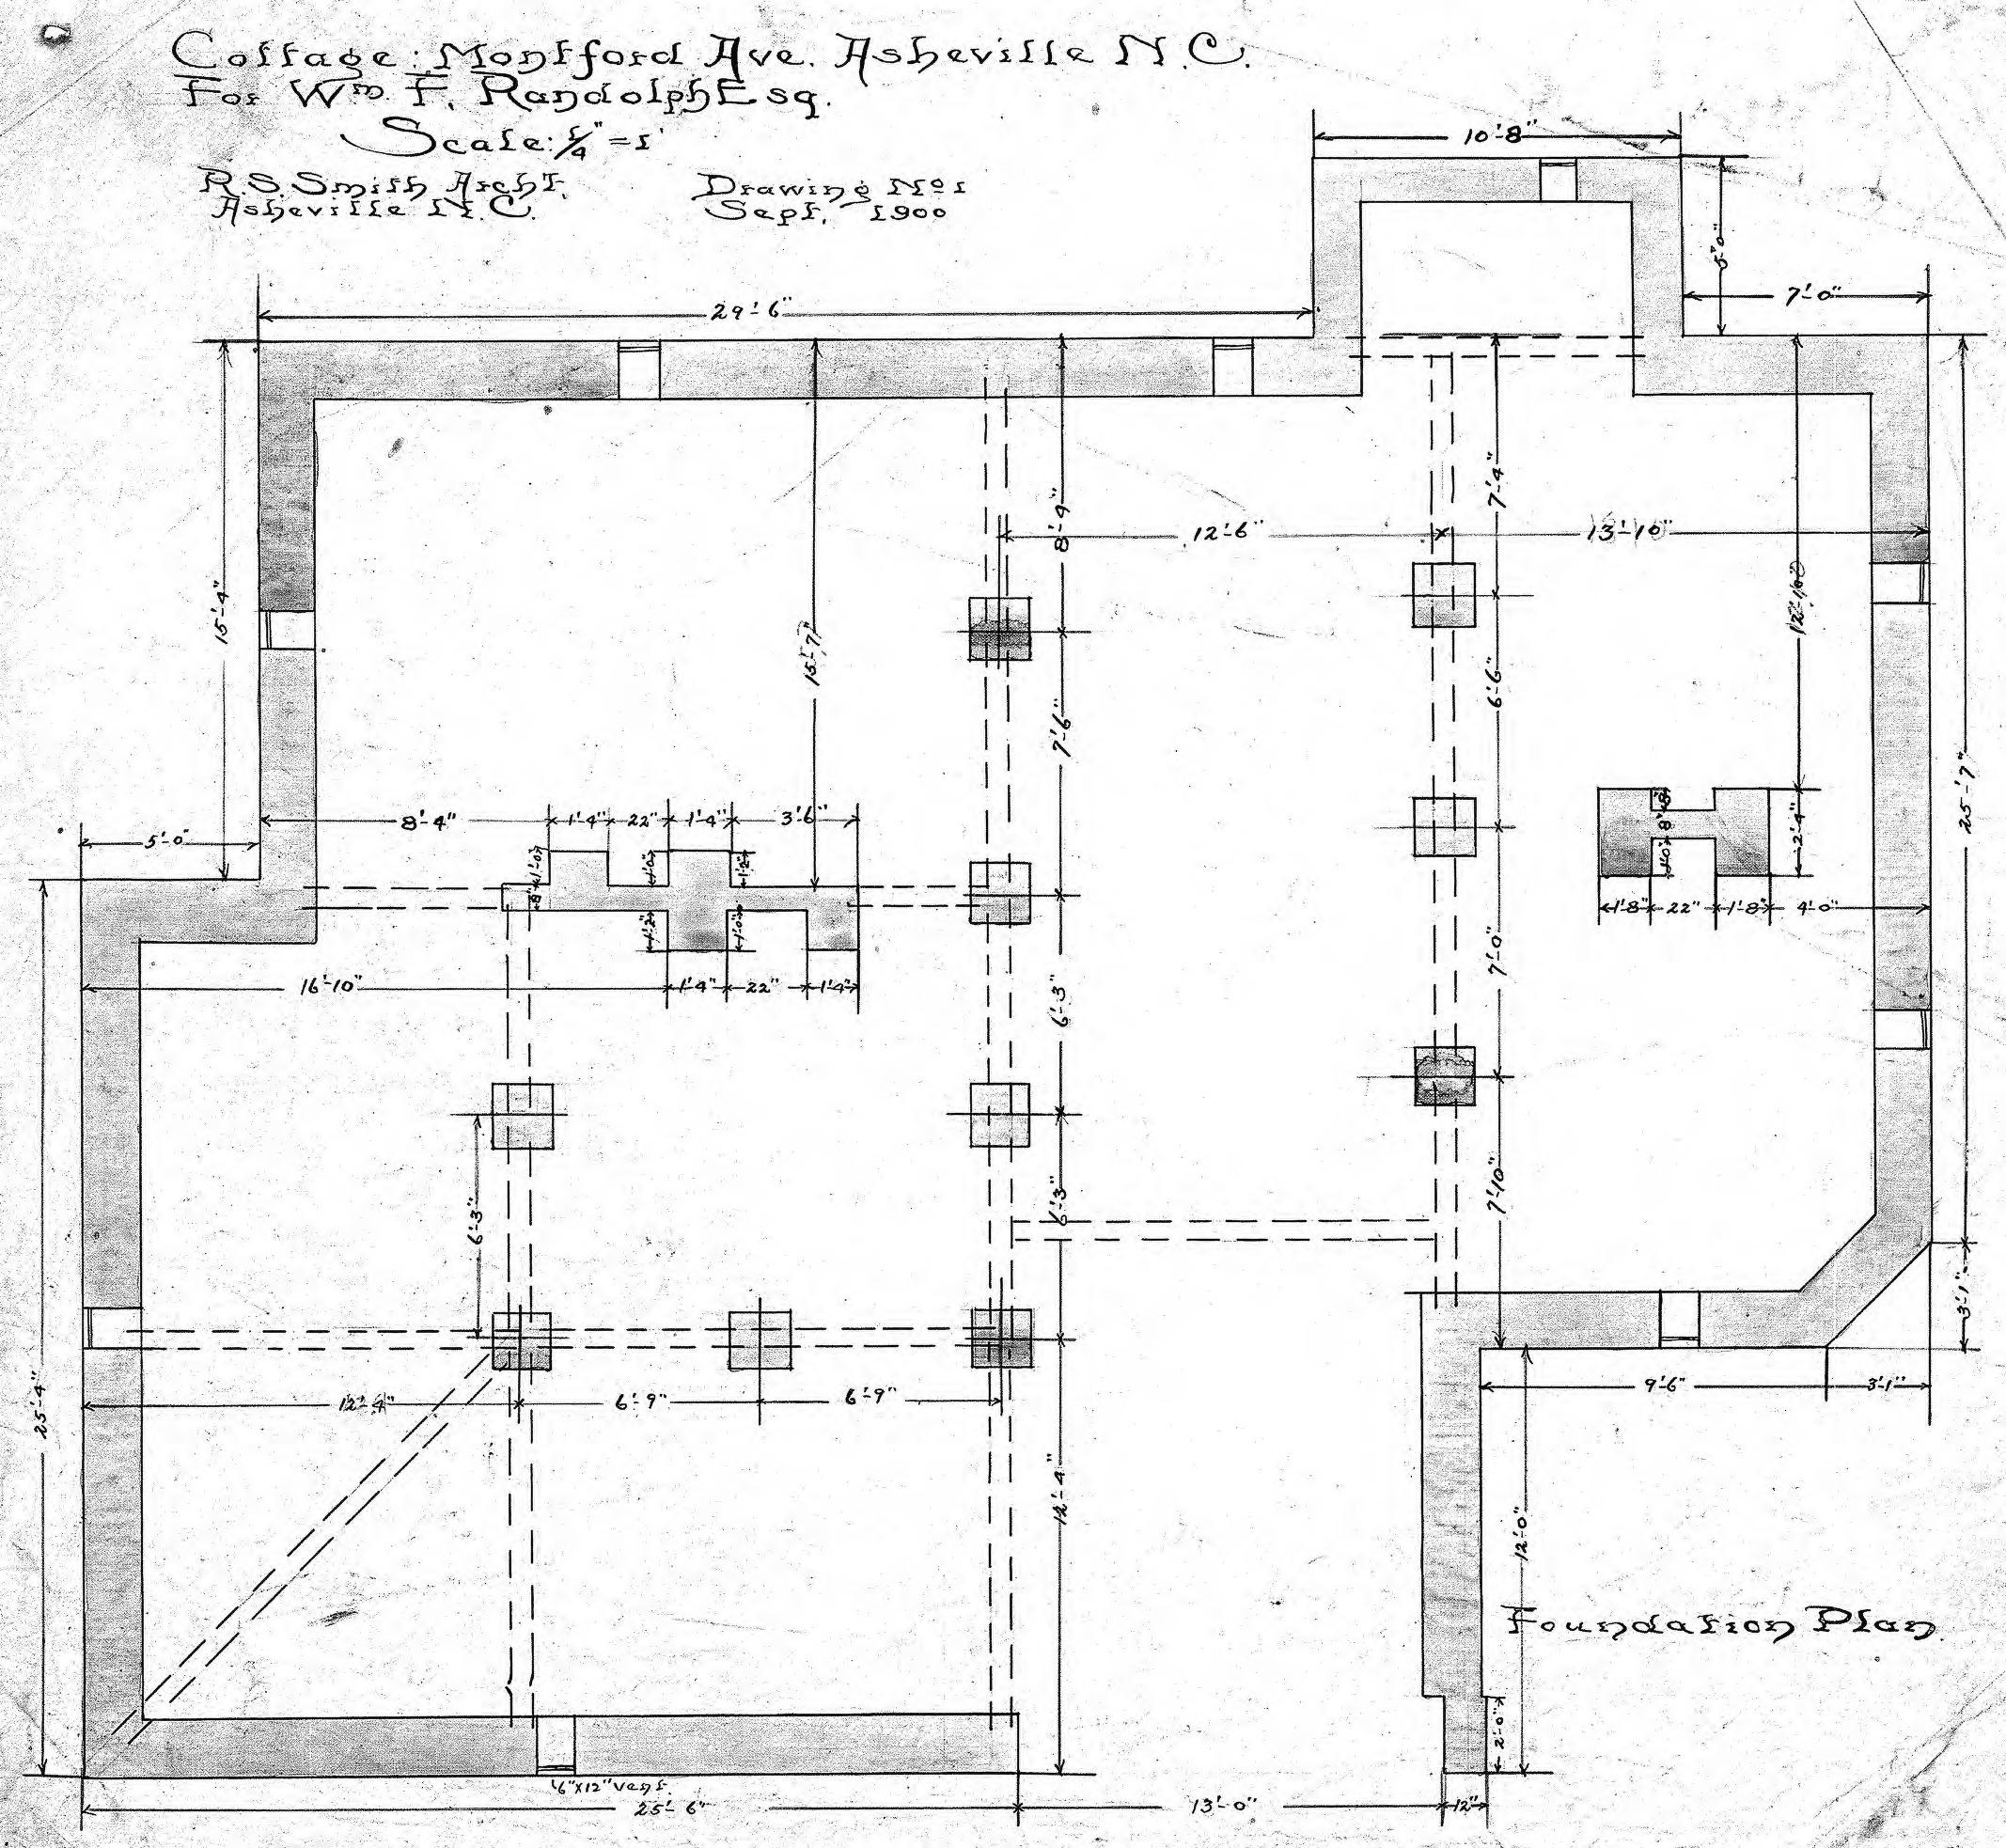 foundation plan drawing